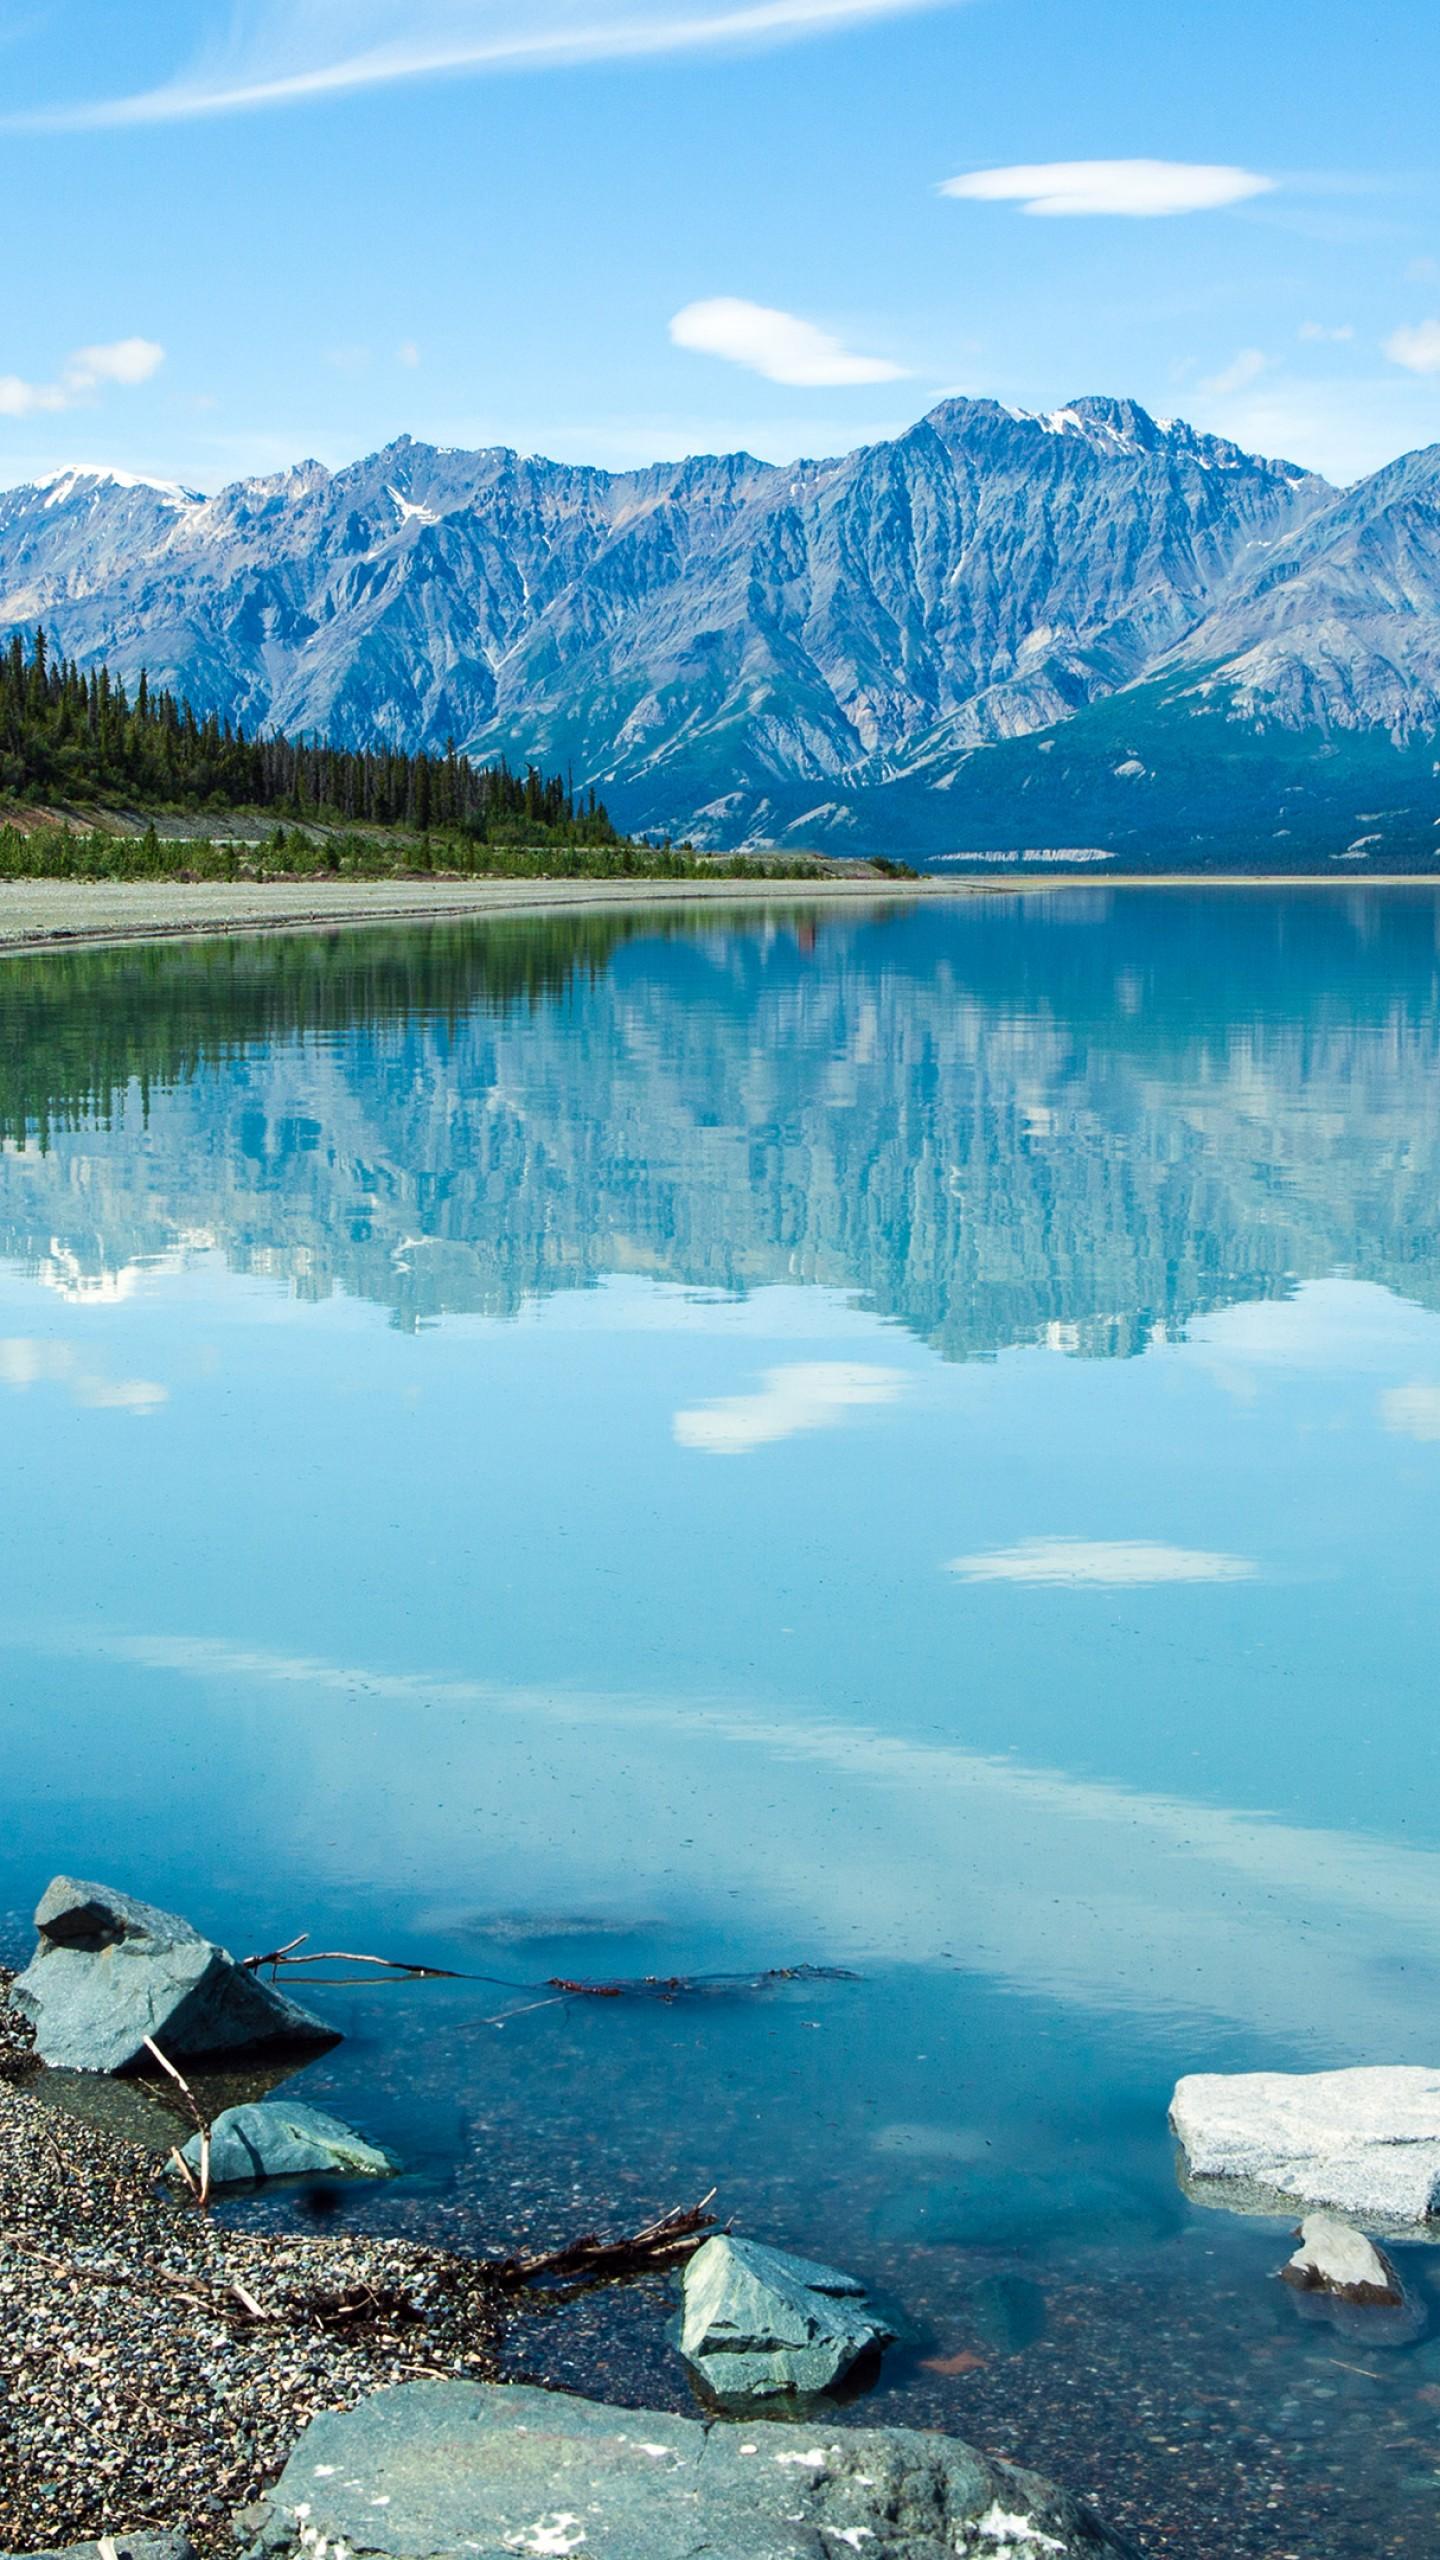 Wallpaper Canada 5k 4k Wallpaper Kluane Lake Yukon Landscape Mountain Nature 12505